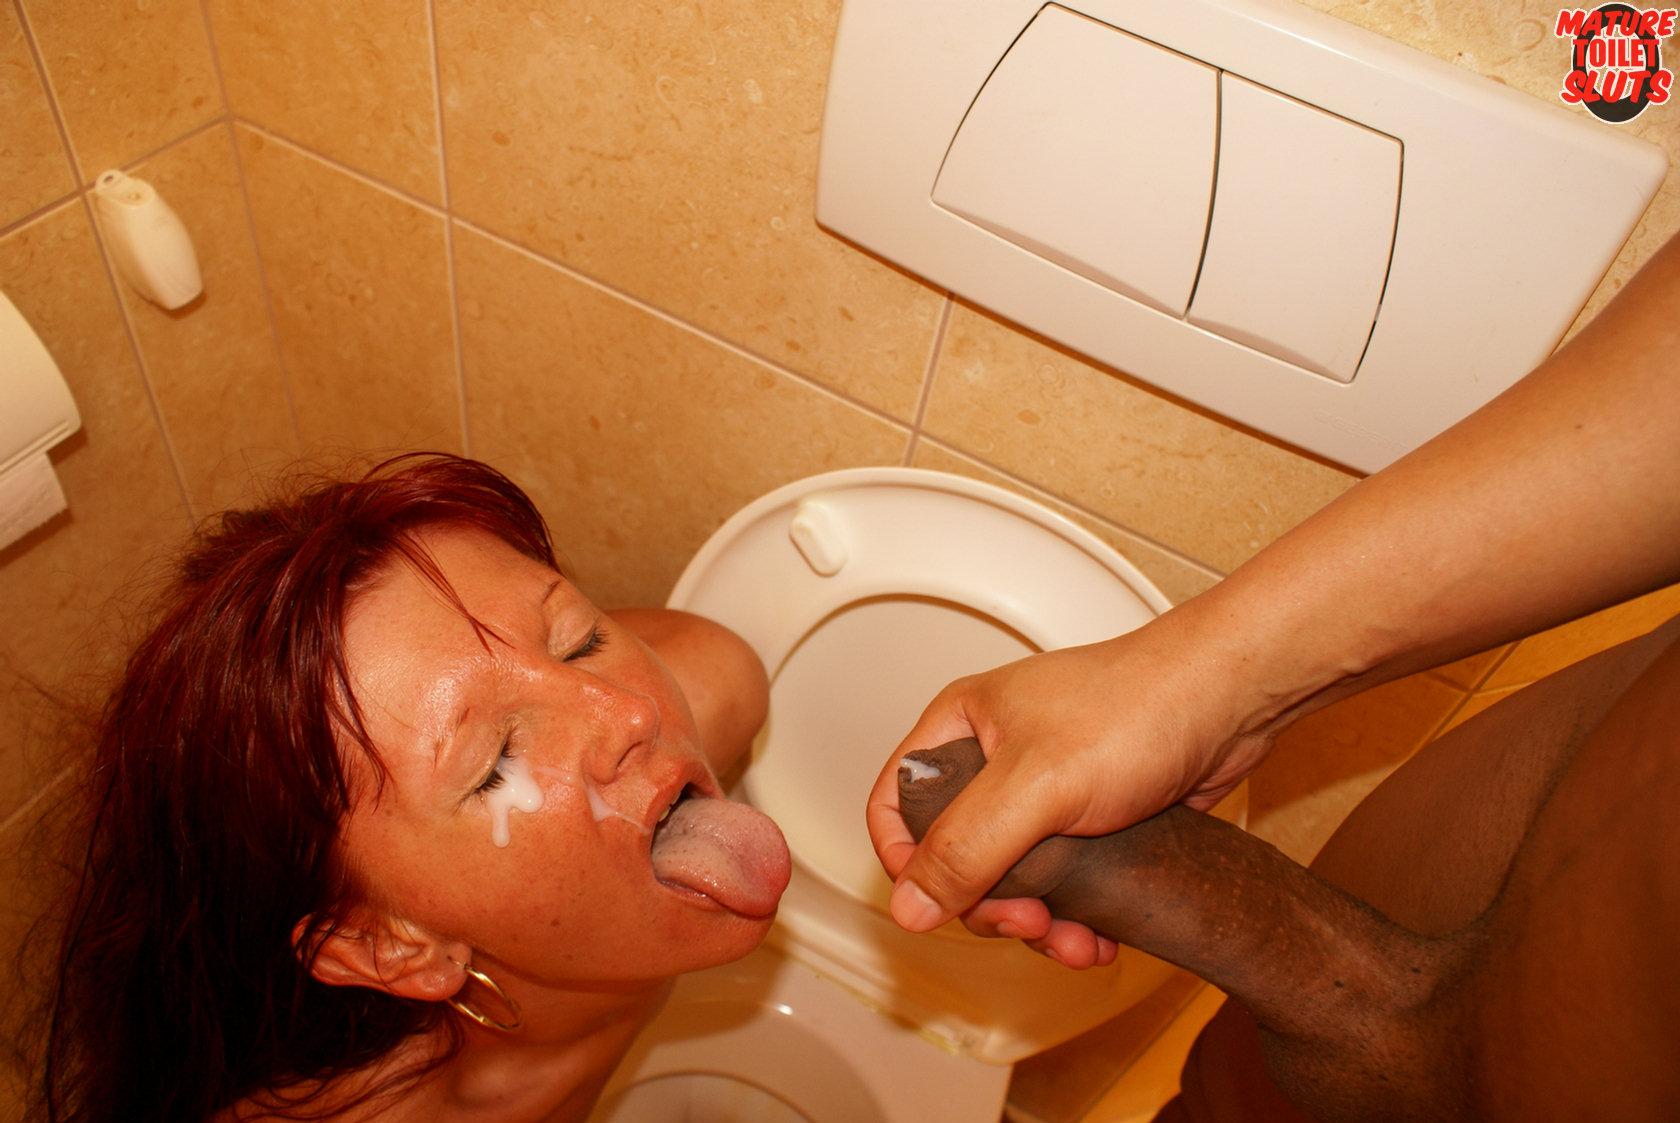 Трахнул тётку в туалете, В туалете порно, смотреть секс в Туалете видео 2 фотография